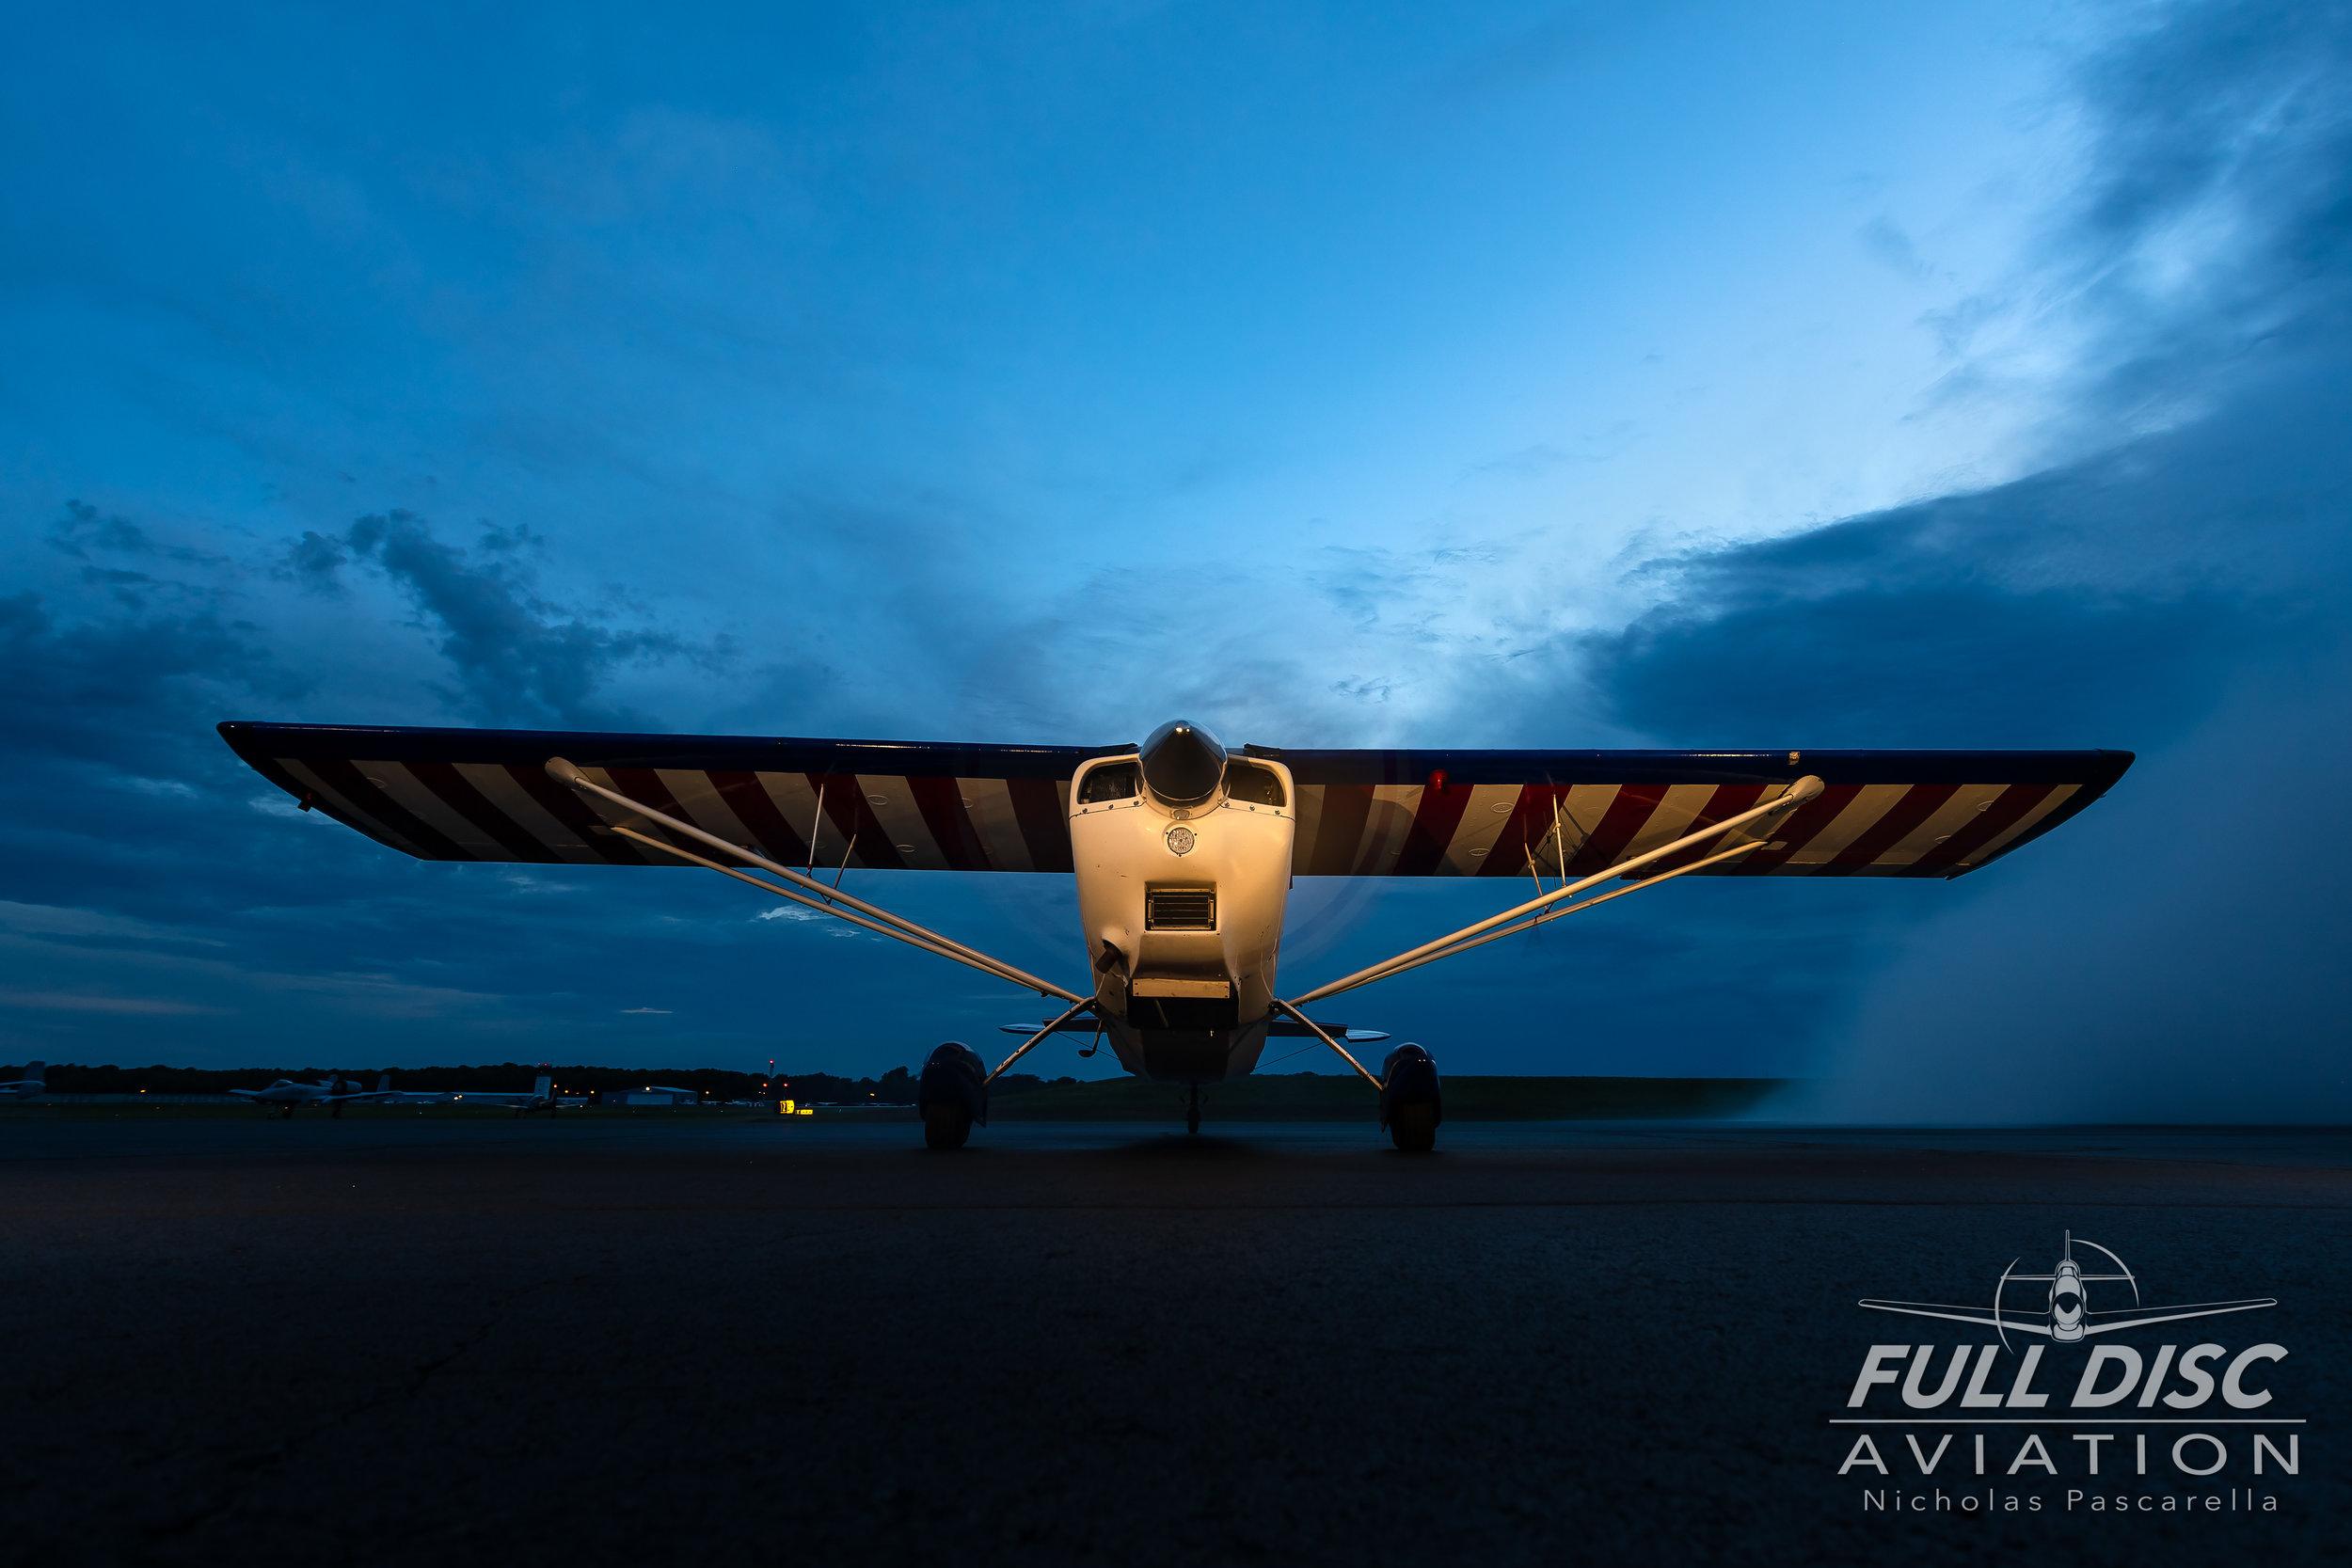 rjgritter_headon_nightrun_nickpascarella_nicholaspascarella_fulldiscaviation_aviation_.jpg